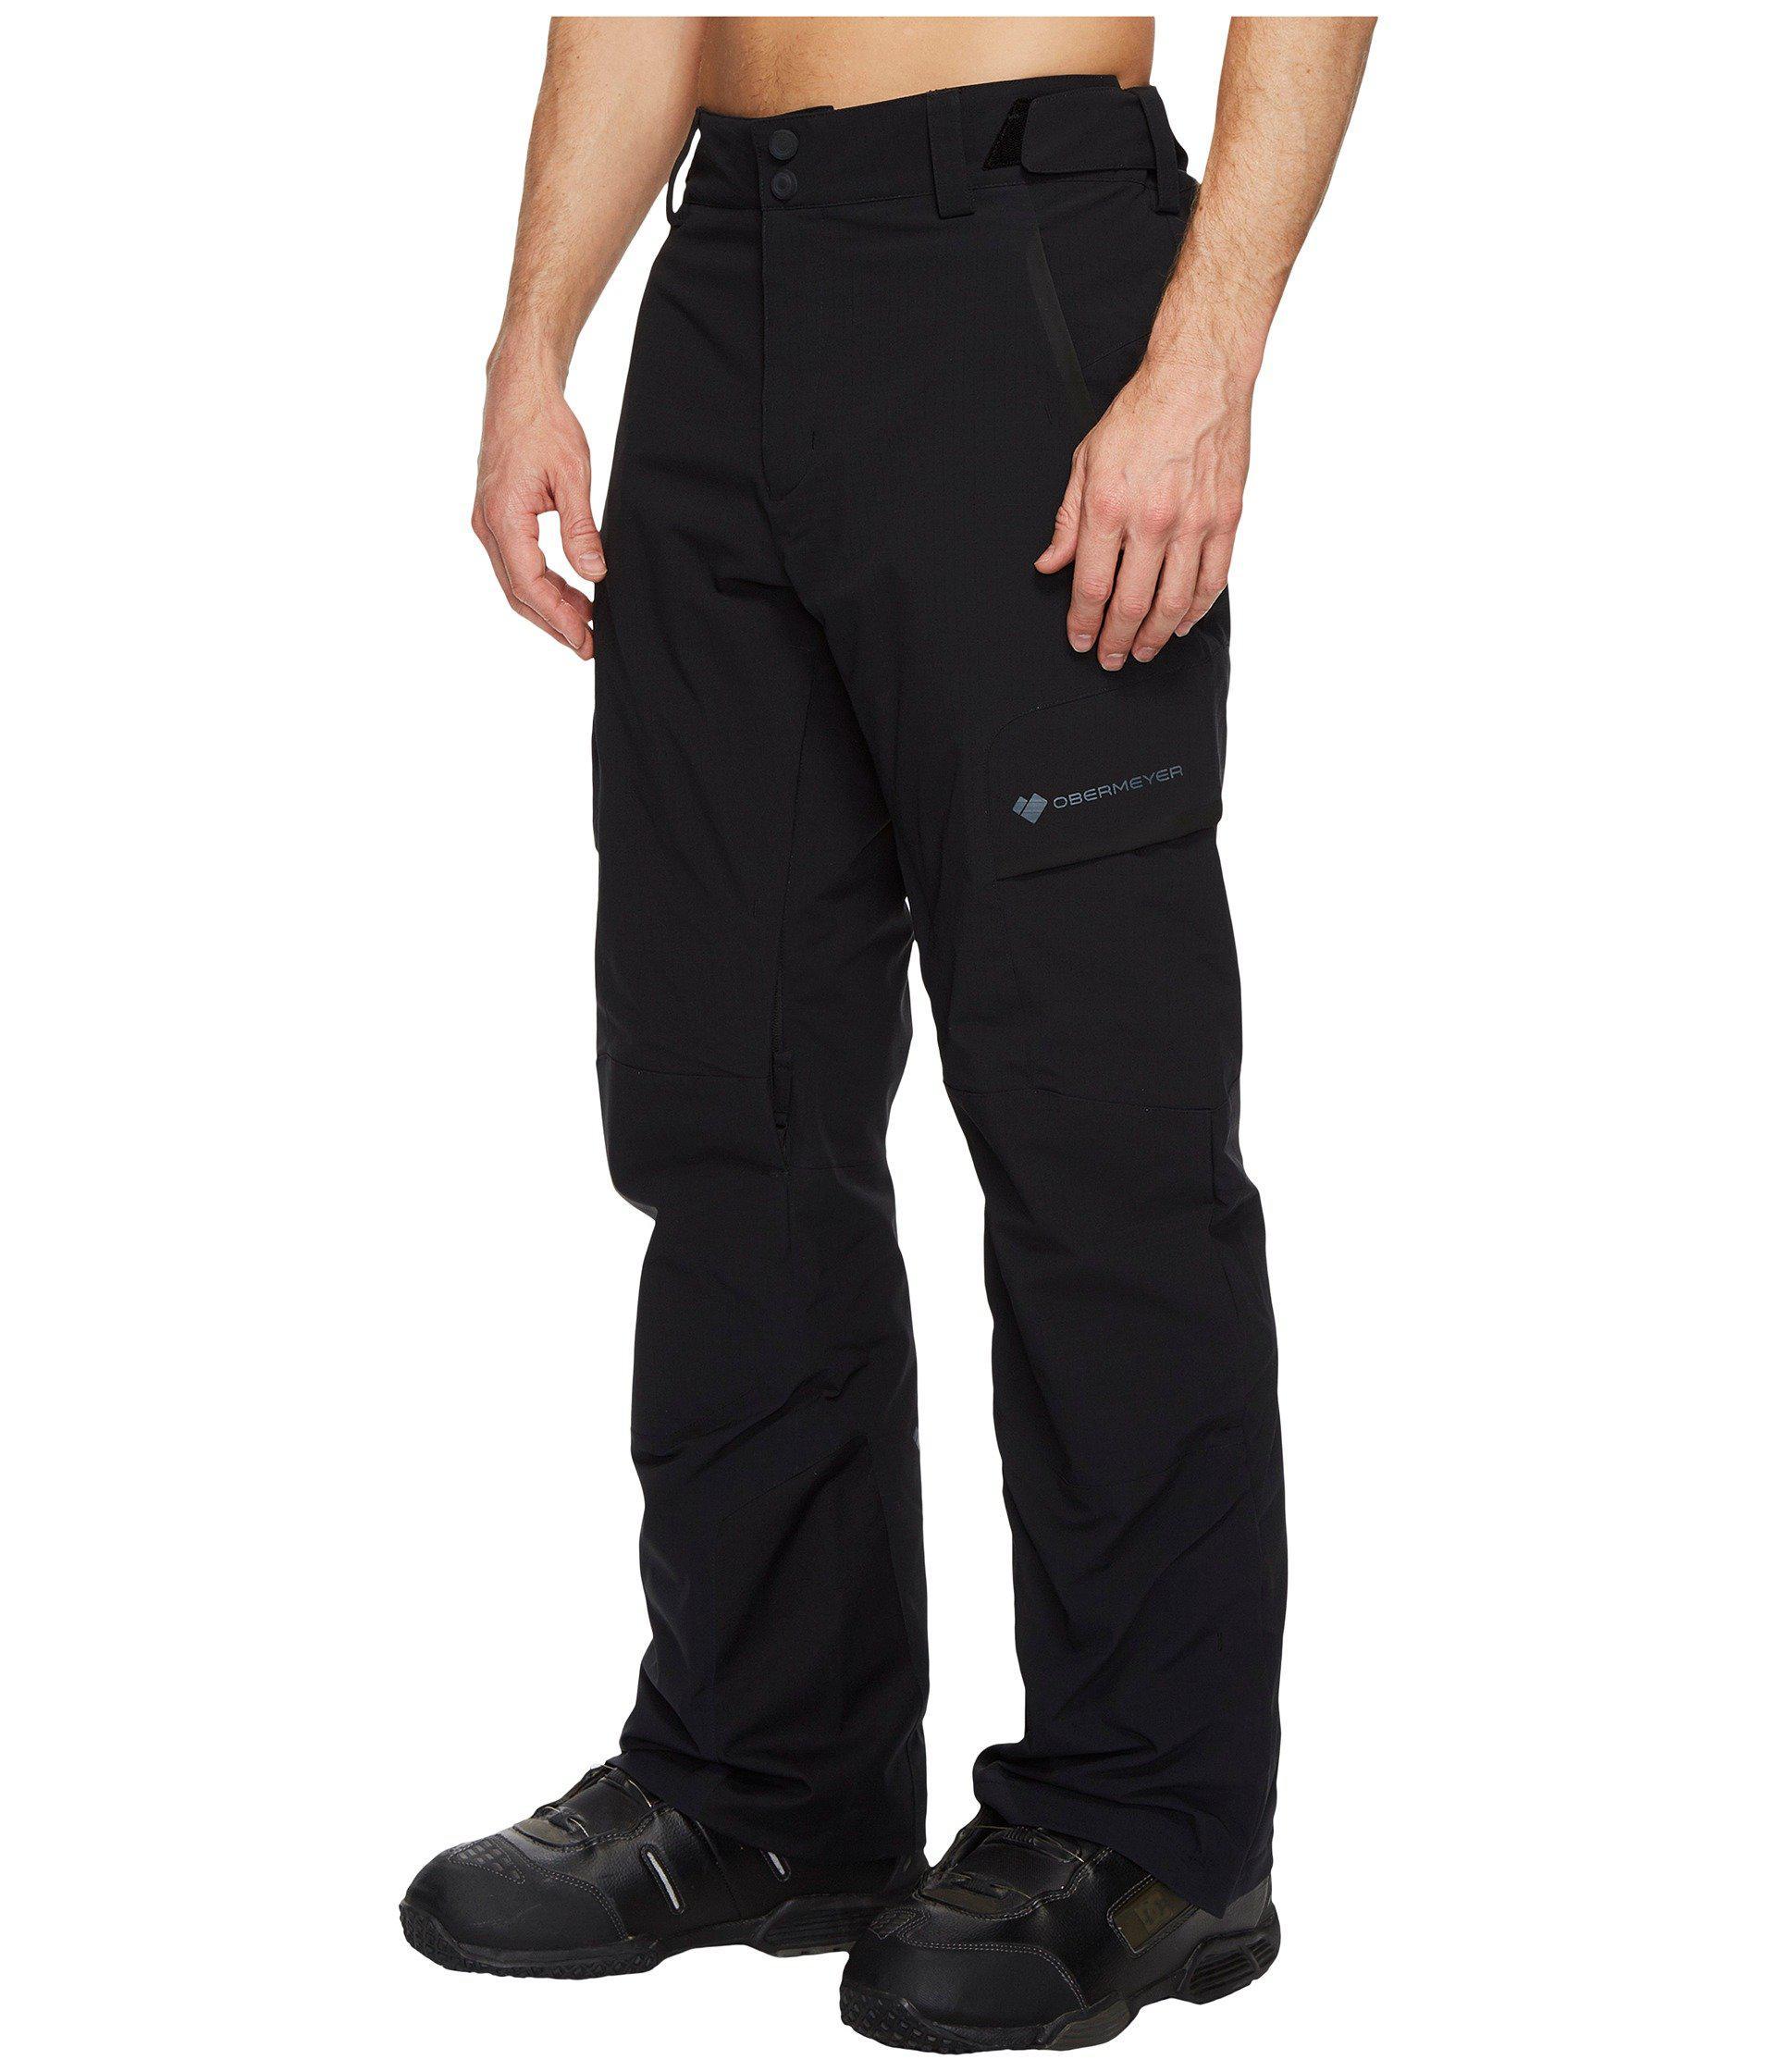 Obermeyer Synthetic Ballistic Pants in Black for Men - Lyst